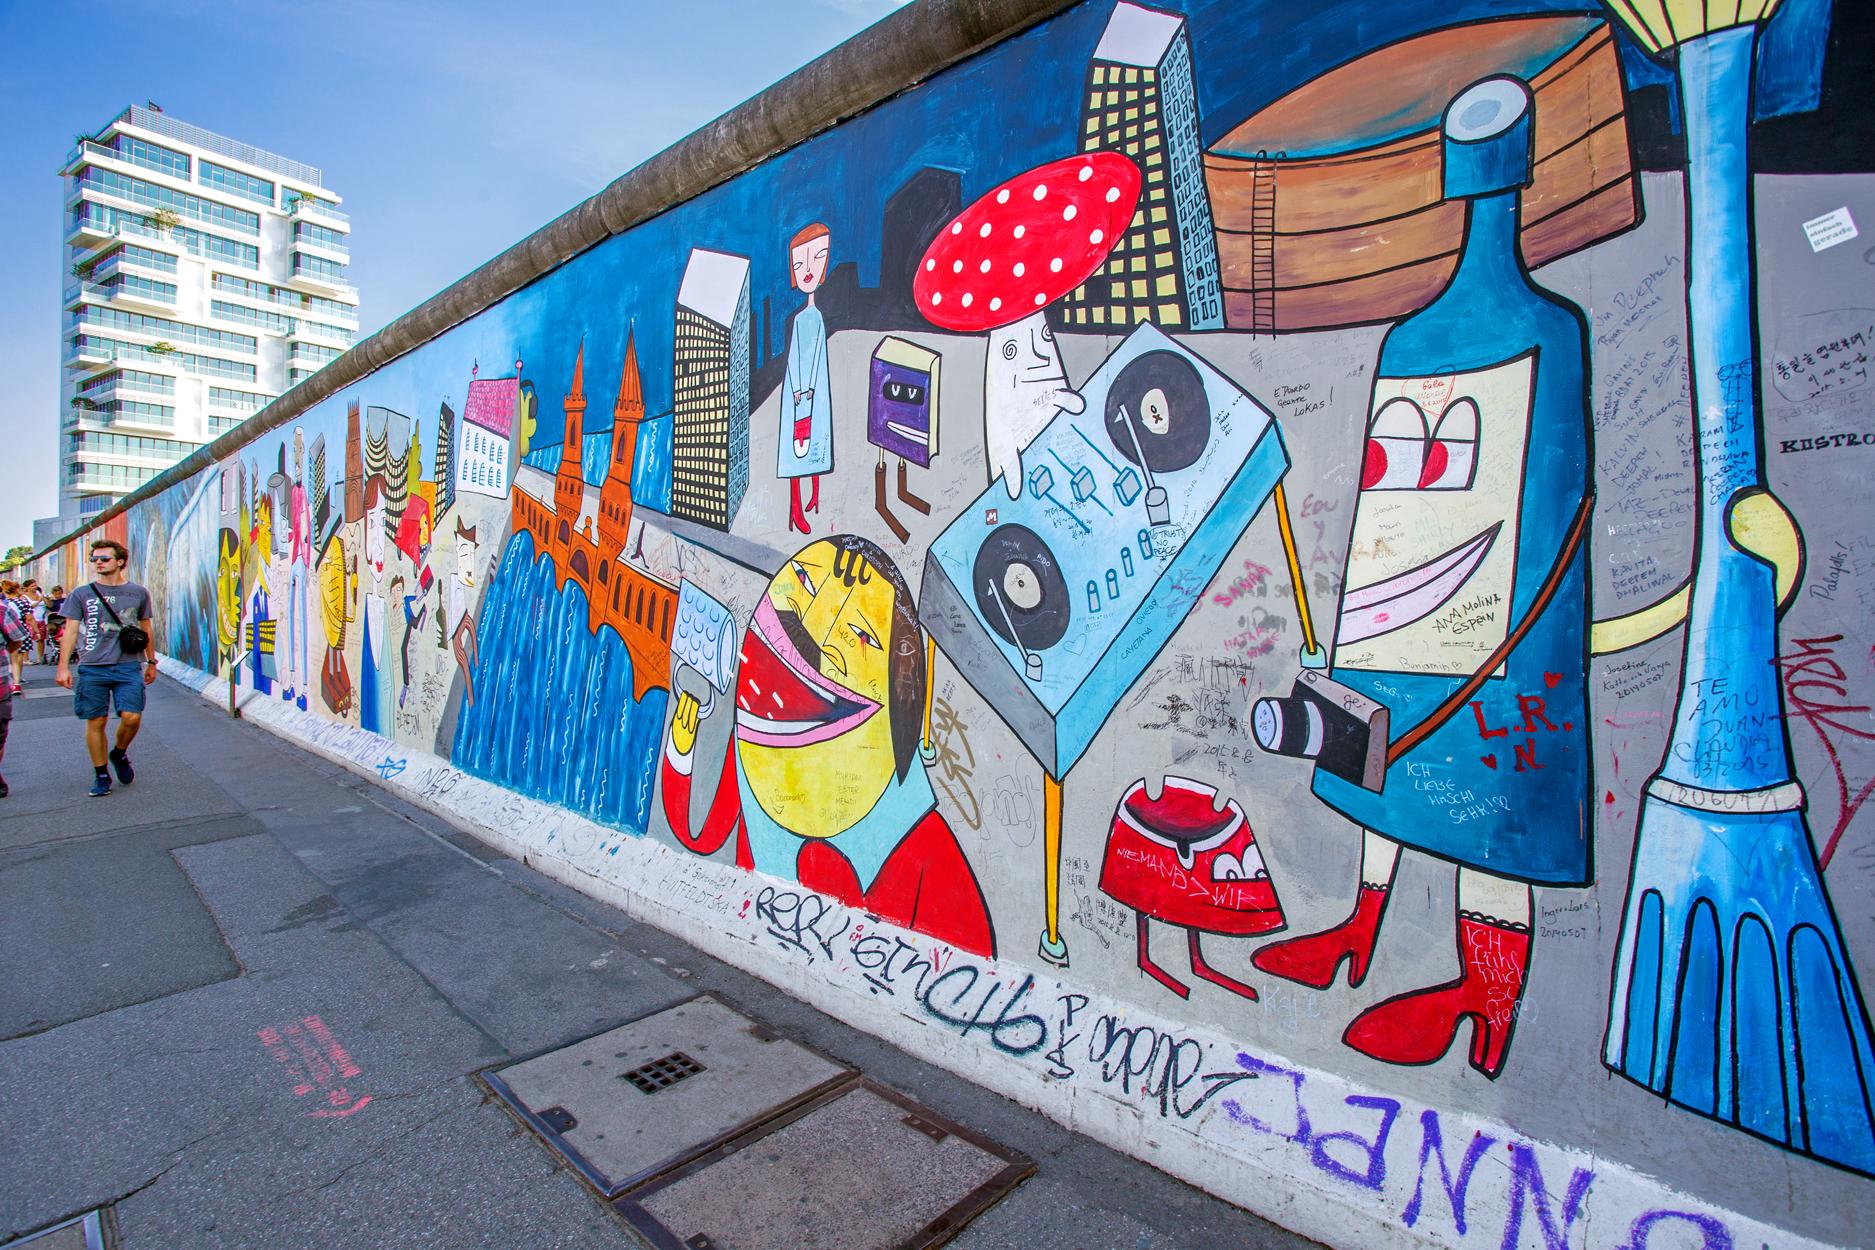 柏林墙遗址纪念公园  Berlin Wall Memorial   -1